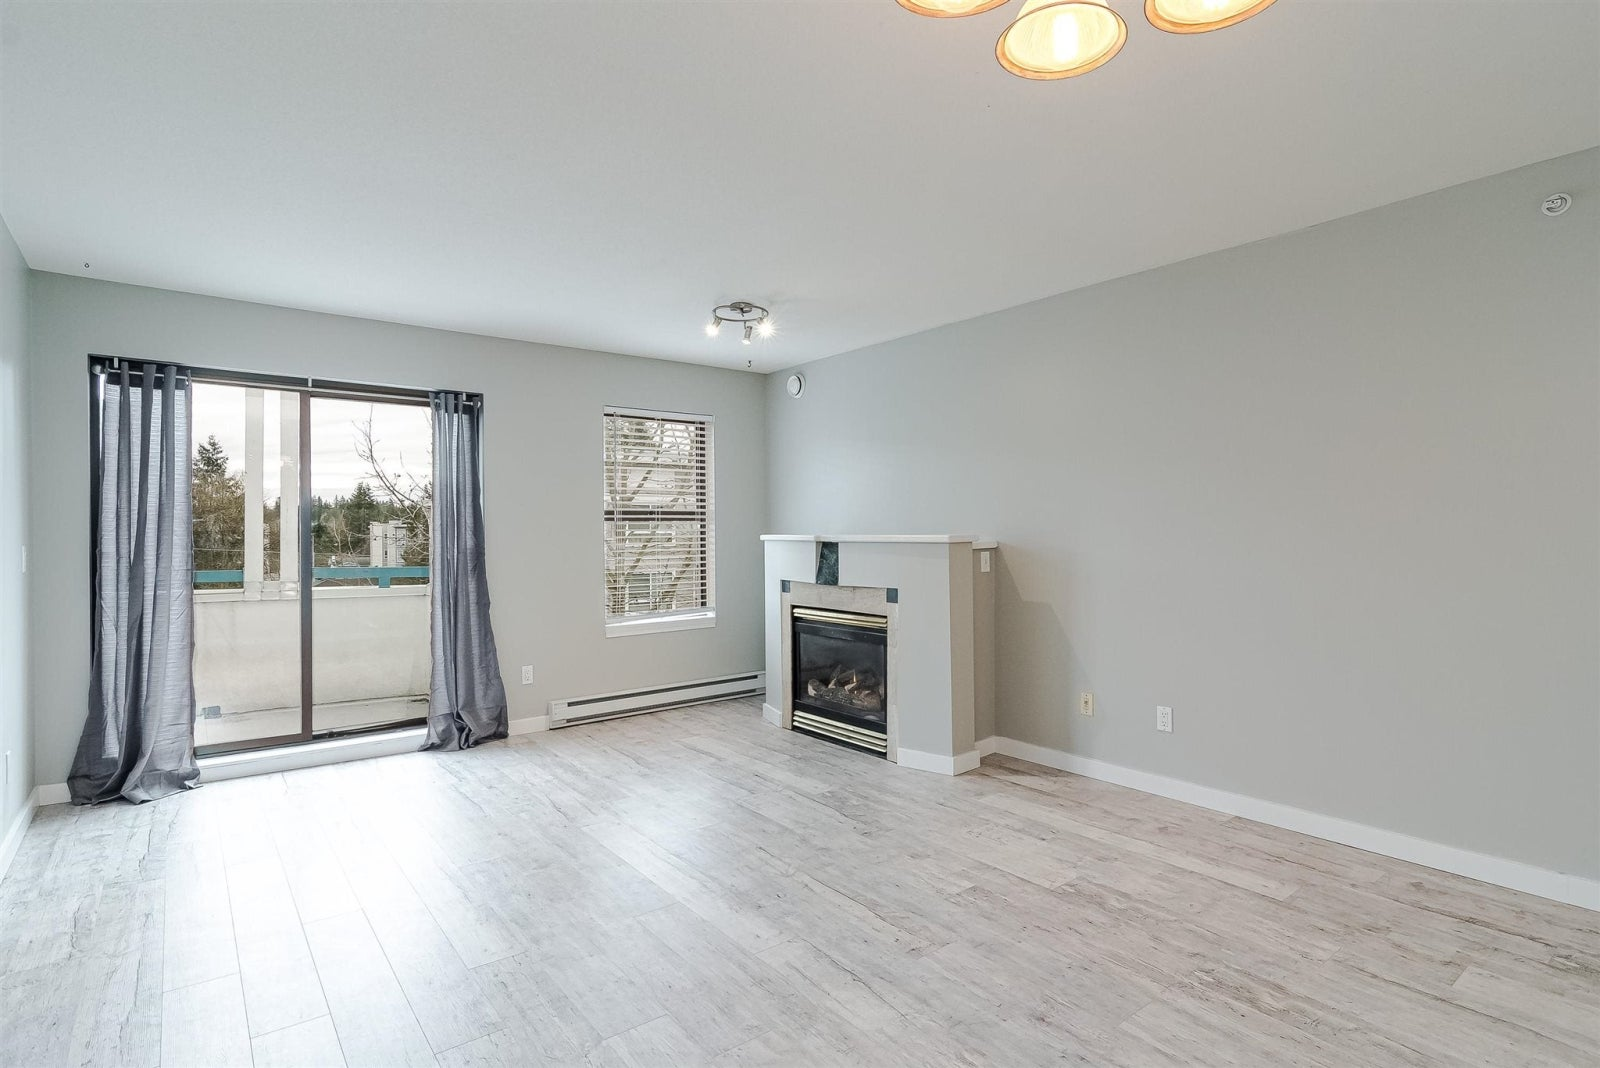 405 20268 54 AVENUE - Langley City Apartment/Condo for sale, 2 Bedrooms (R2604183) #8